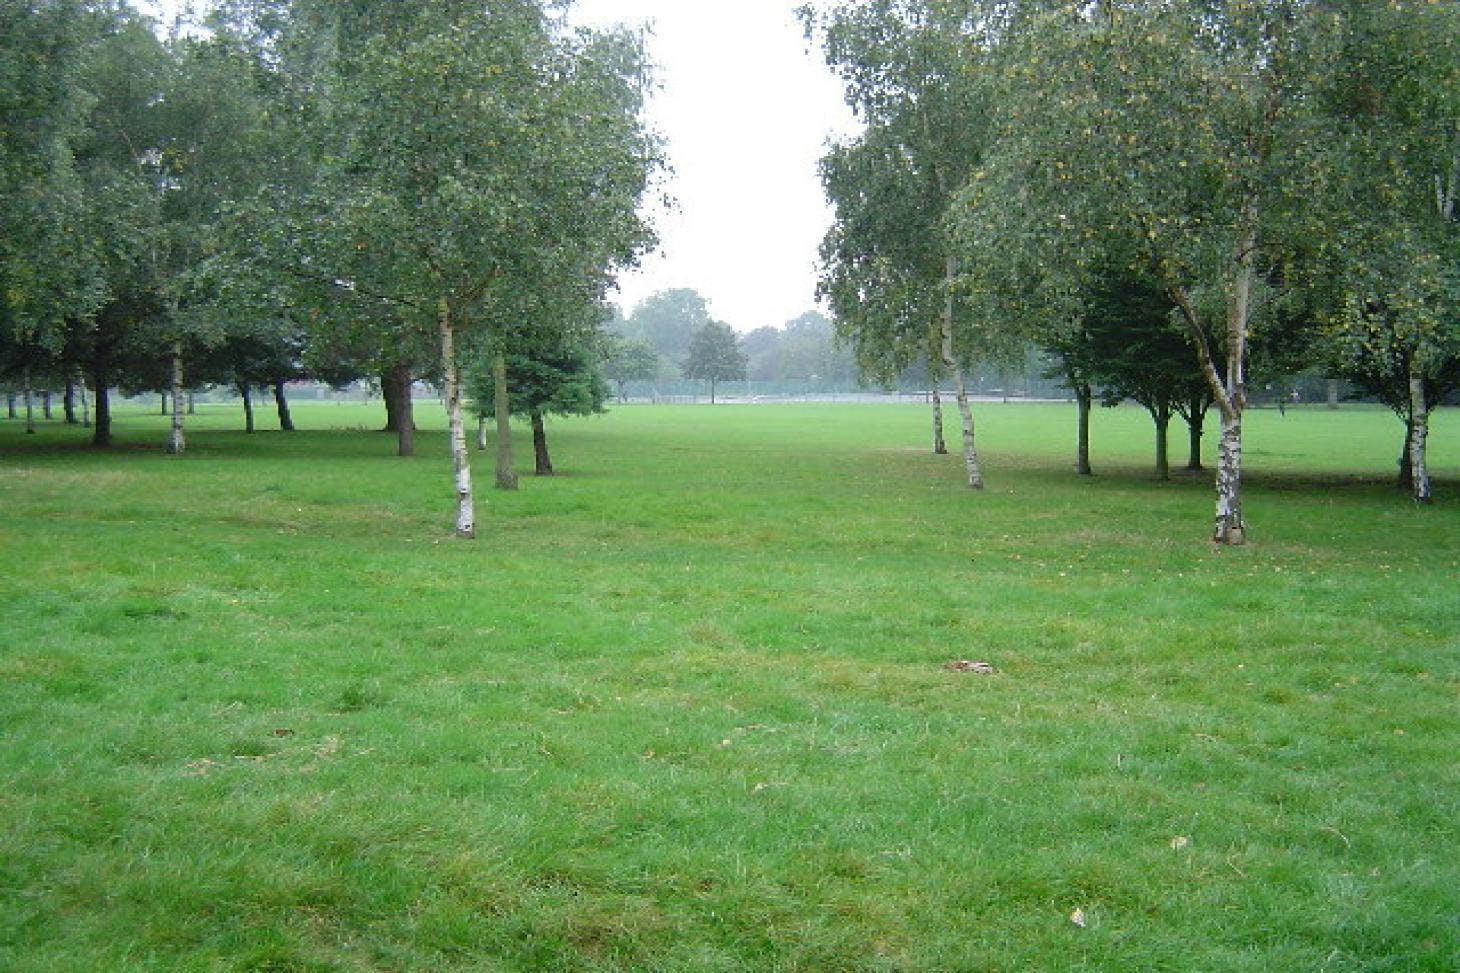 Harrow Recreation Ground Nets | Artificial cricket facilities